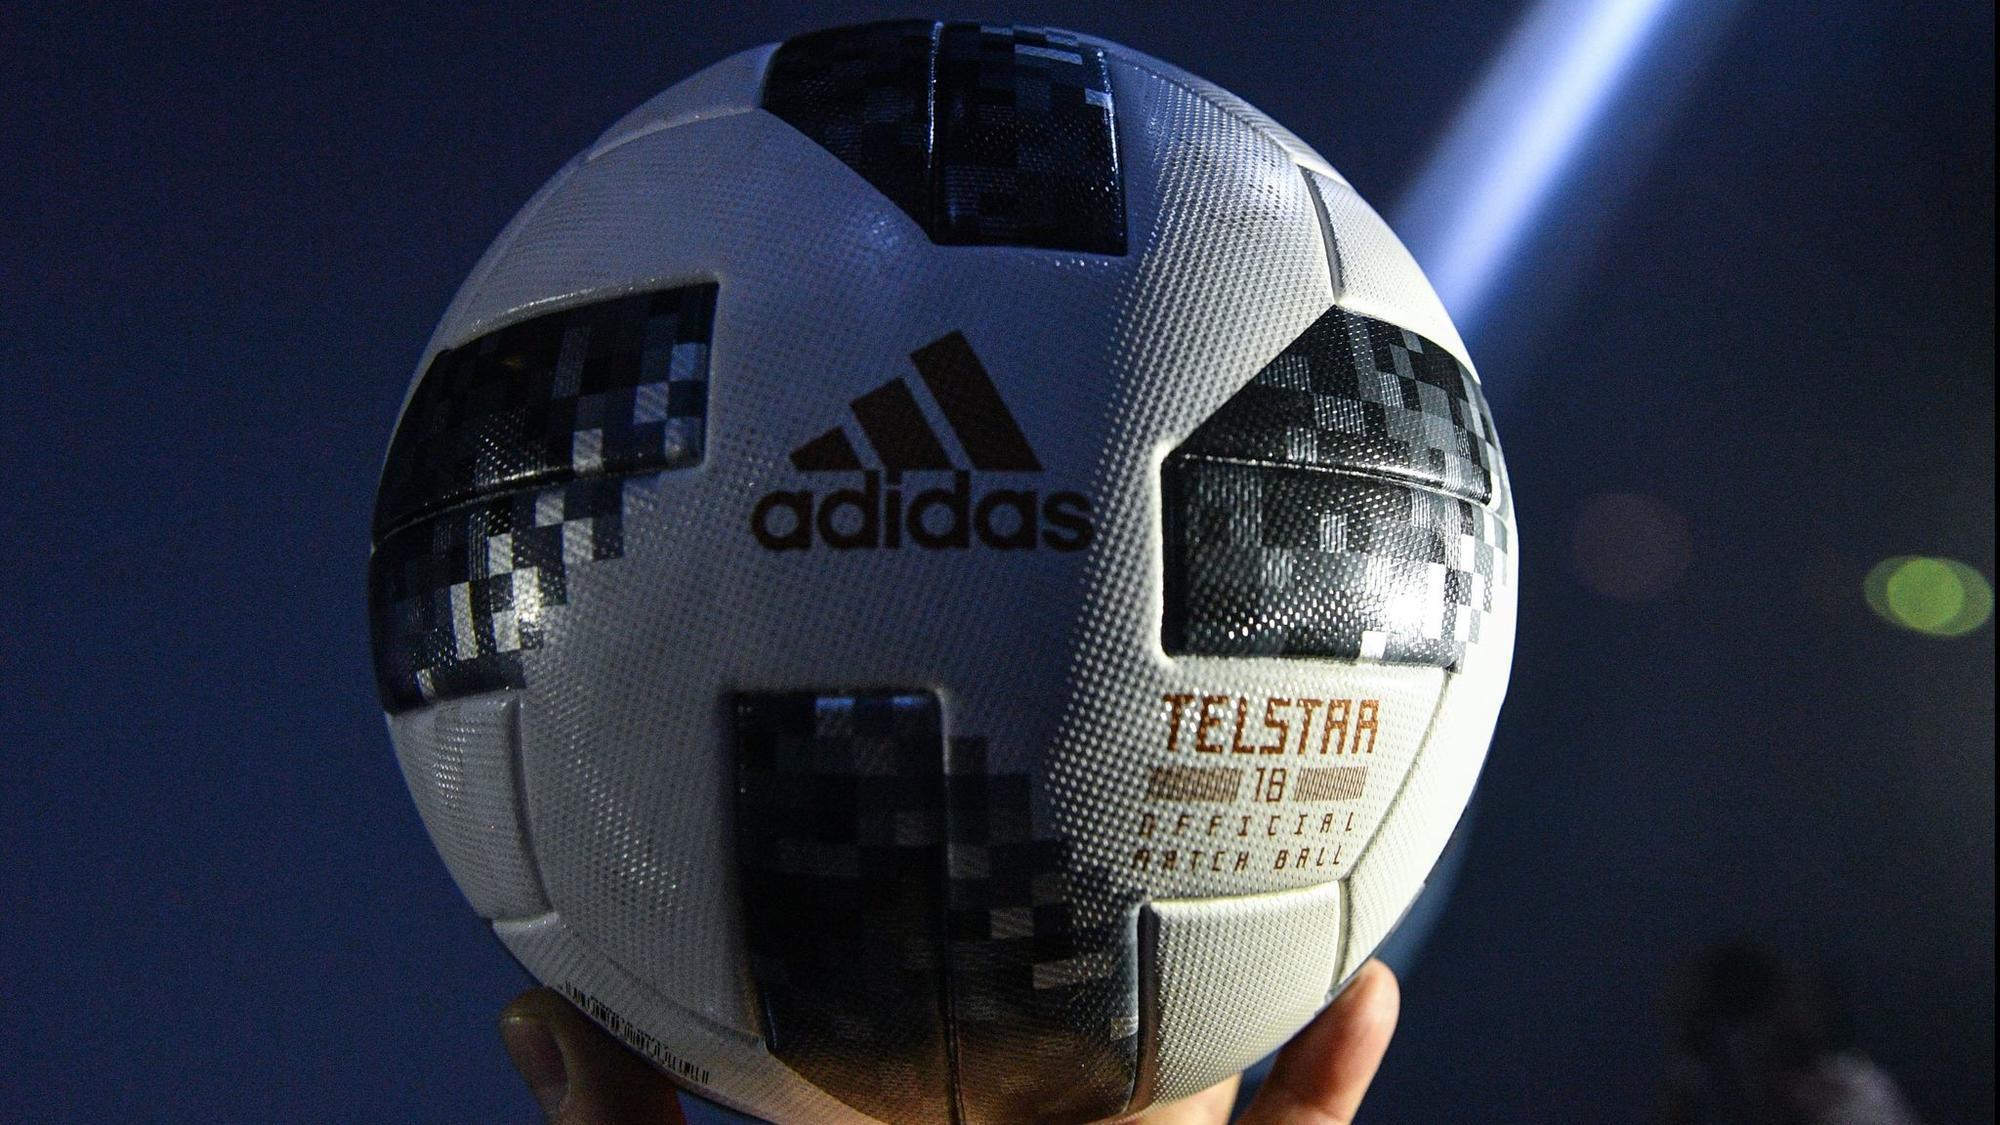 Cool Football Ball World Cup 2018 - ct-hoy-adidas-unveils-telstar-18-the-2018-world-cup-match-ball-20171109  Photograph_179566 .com/img-5a04adff/turbine/ct-hoy-adidas-unveils-telstar-18-the-2018-world-cup-match-ball-20171109